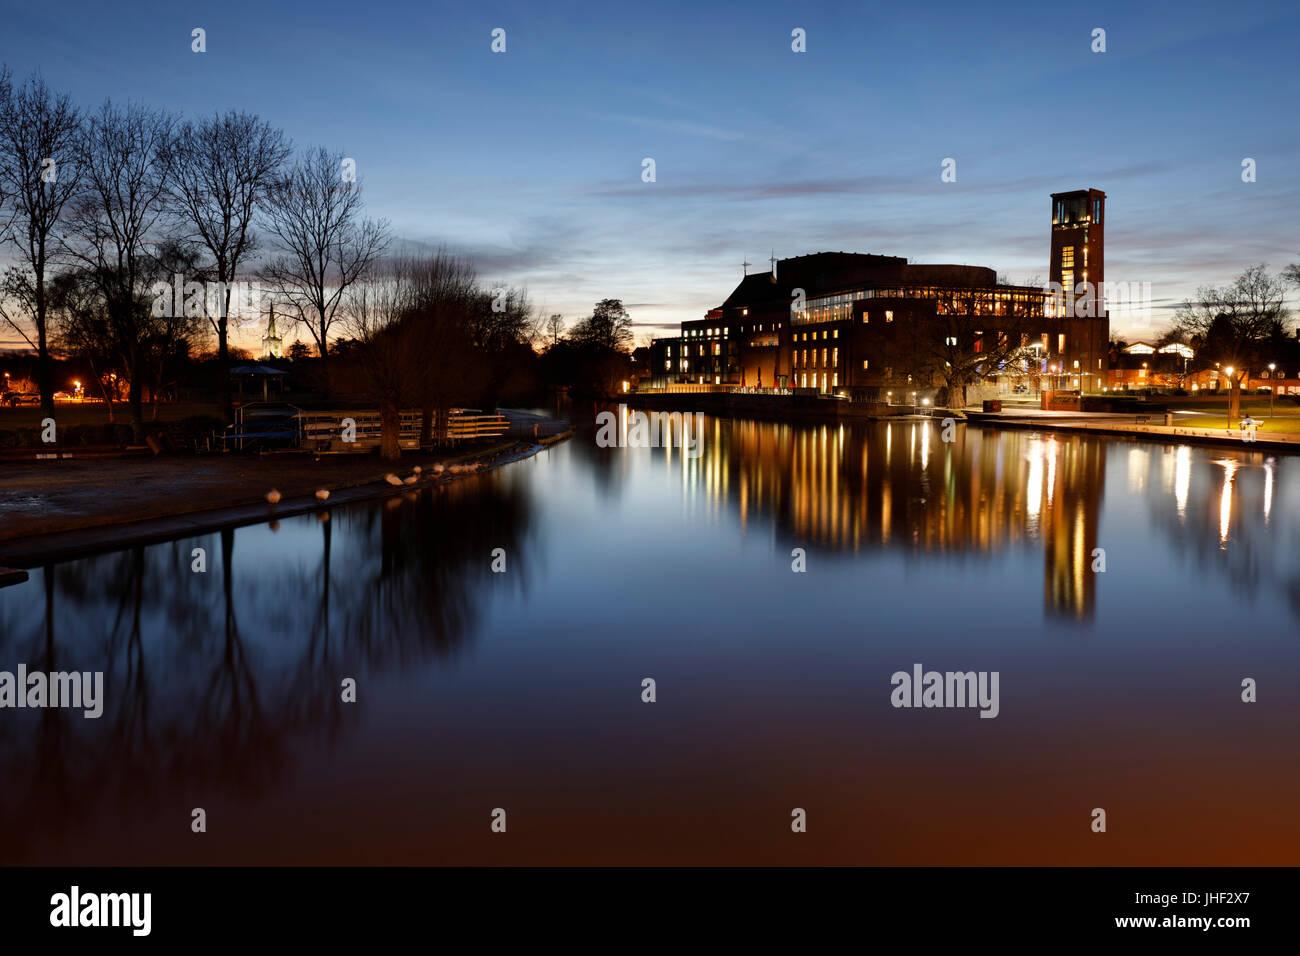 Royal Shakespeare Theatre on the River Avon at night, Stratford-upon-Avon, Warwickshire, England, United Kingdom, - Stock Image